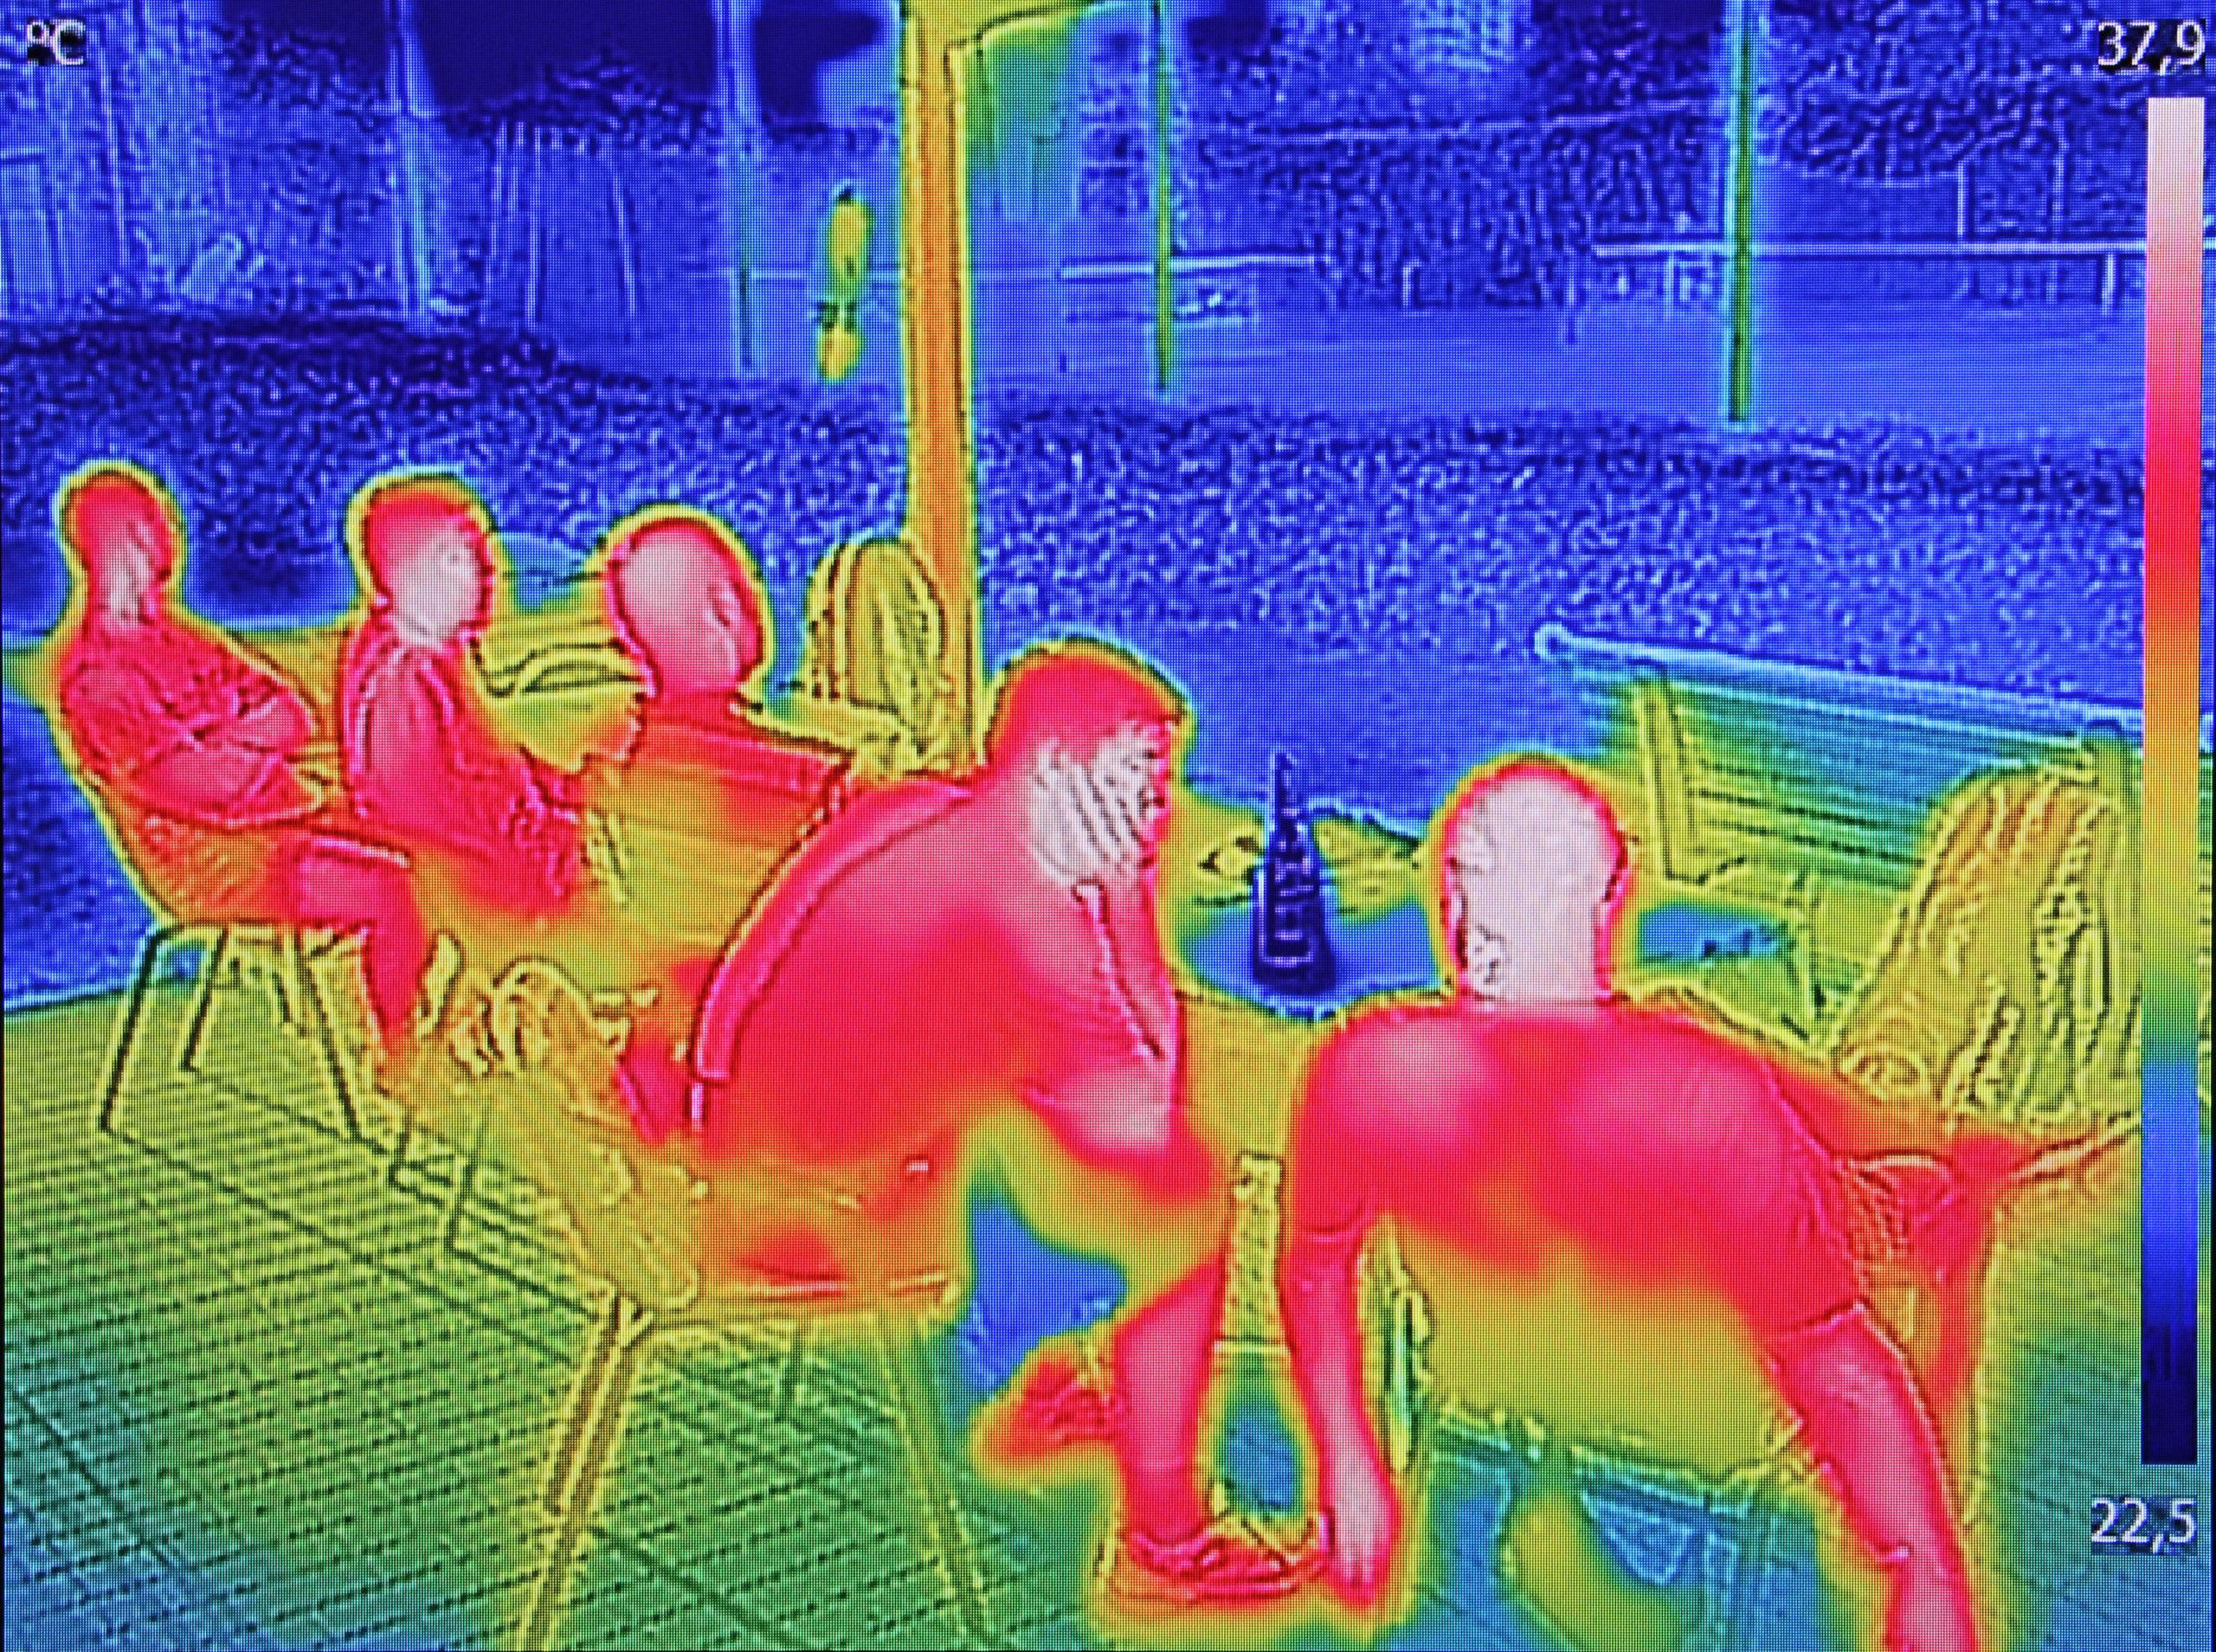 Temperature measurement systems